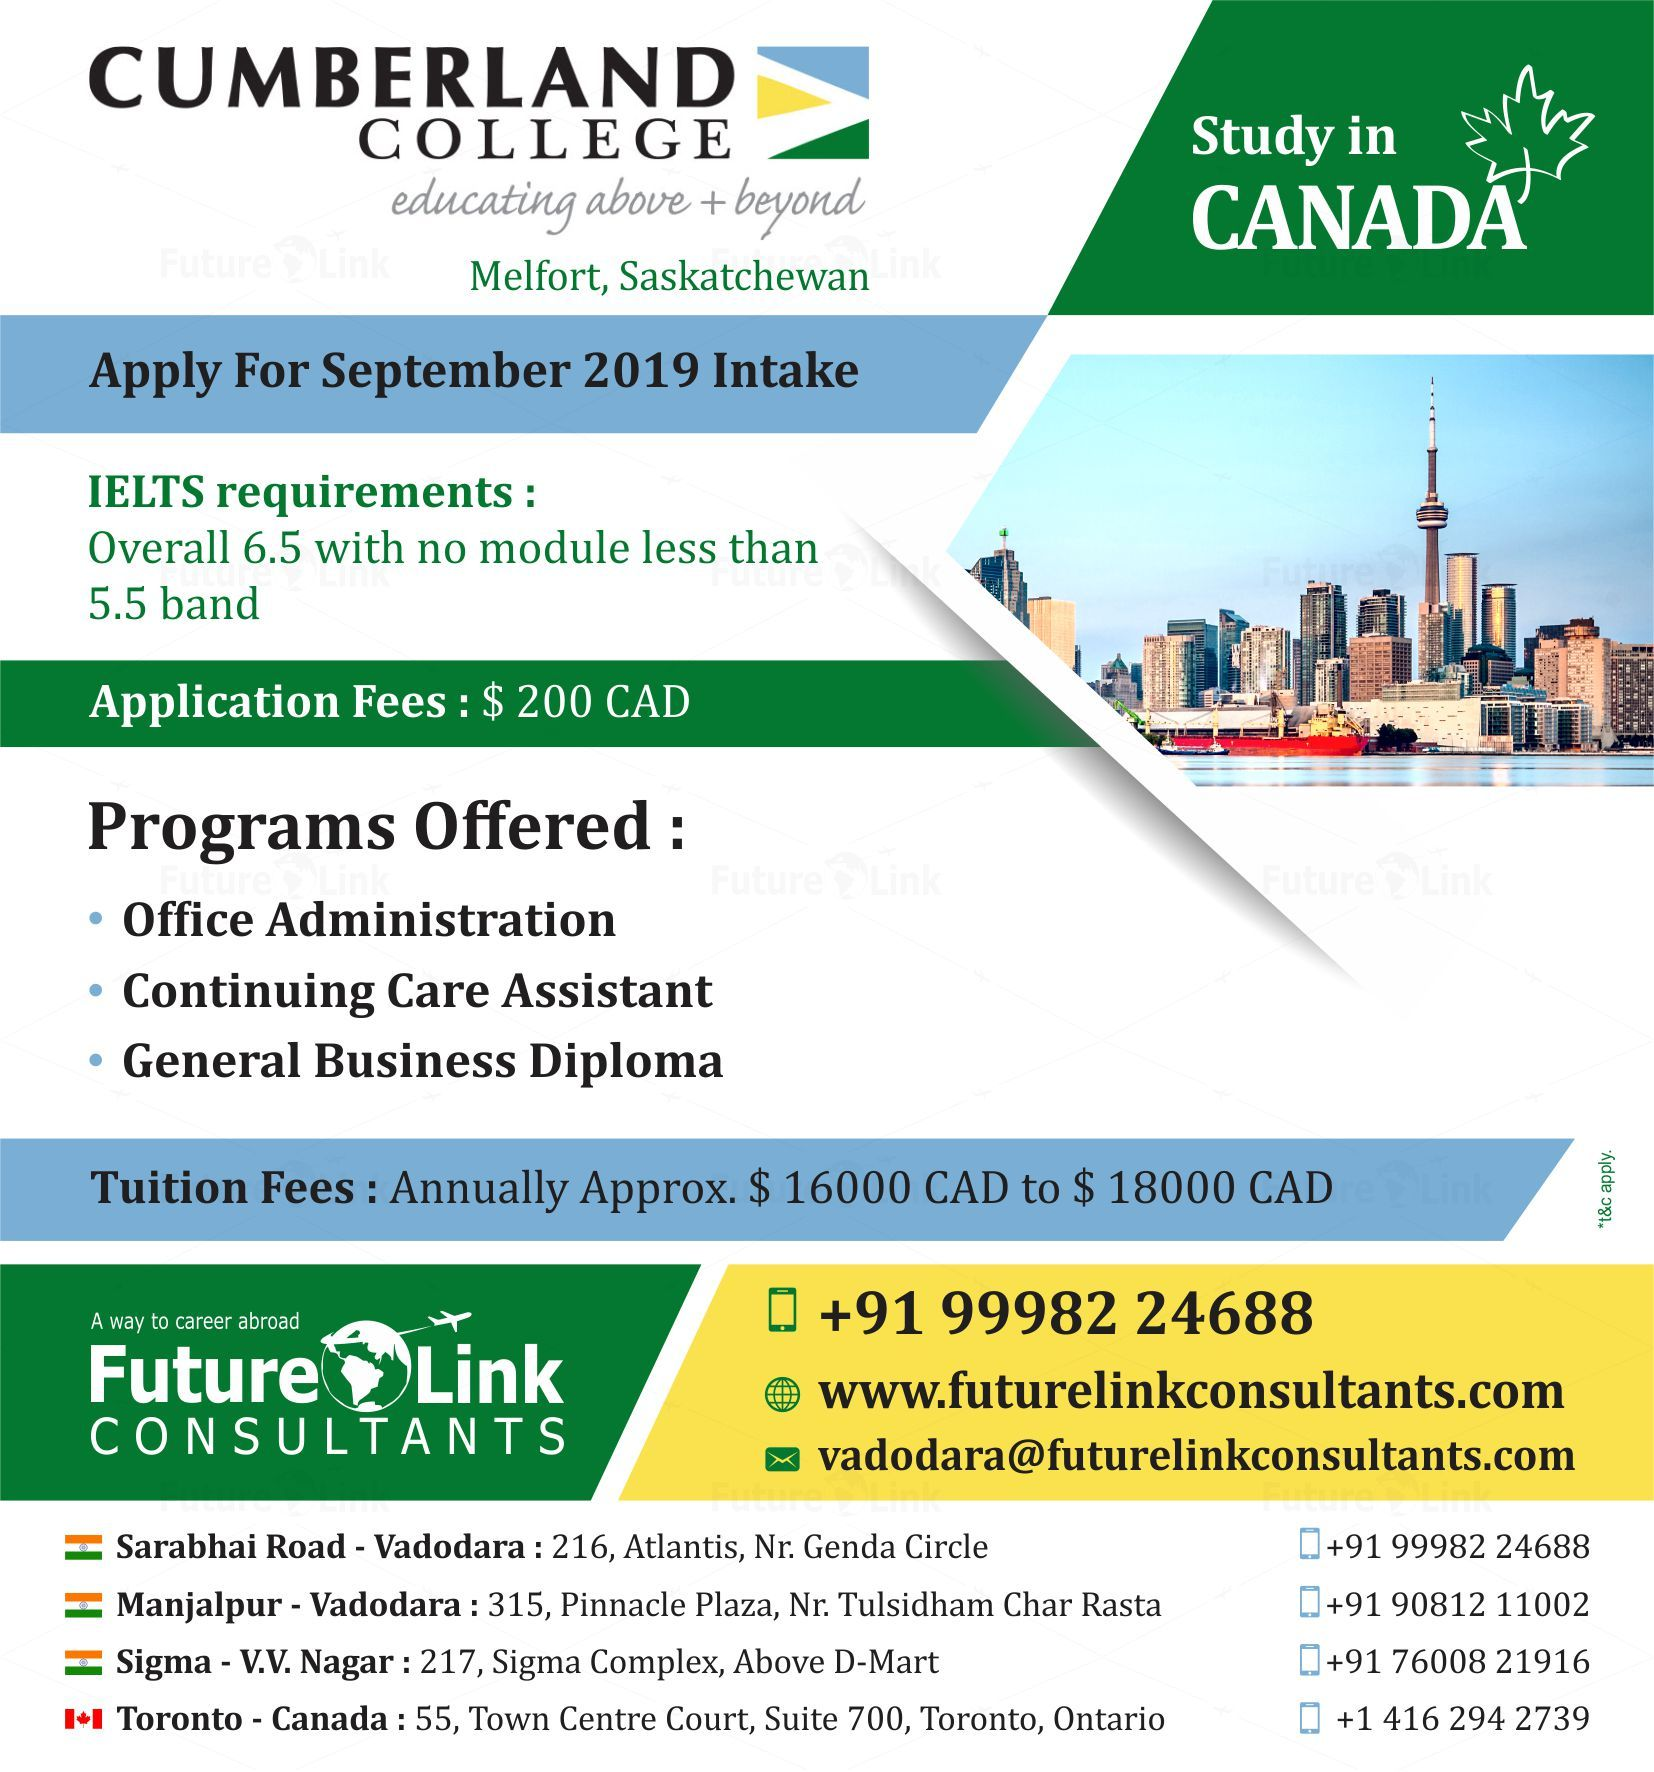 Hurry up! Cumberland College, Melfort, Saskatchewan